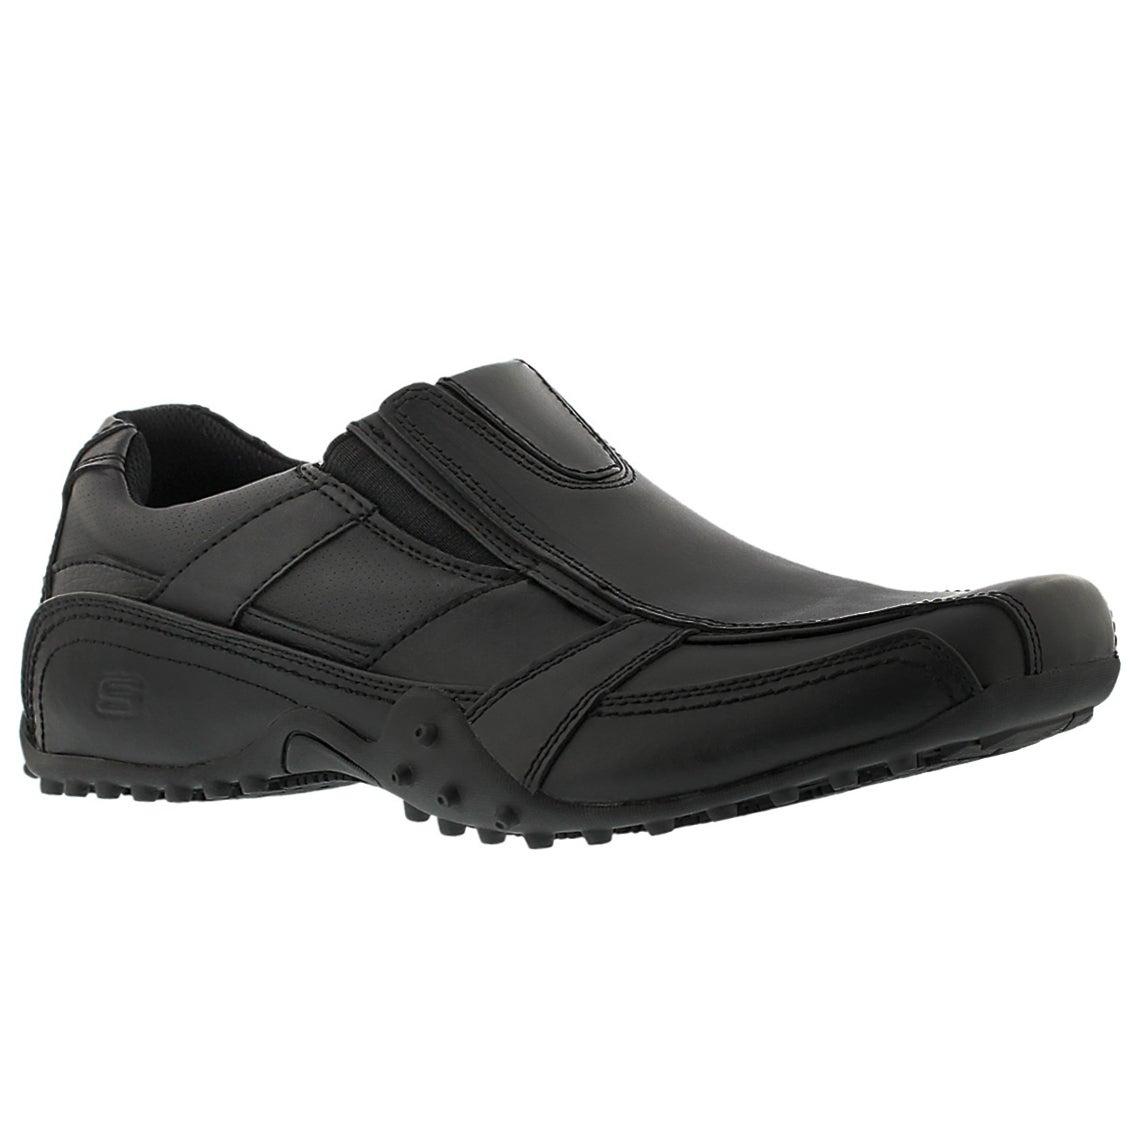 Men's ROCKLAND HOOPER black casual slip ons